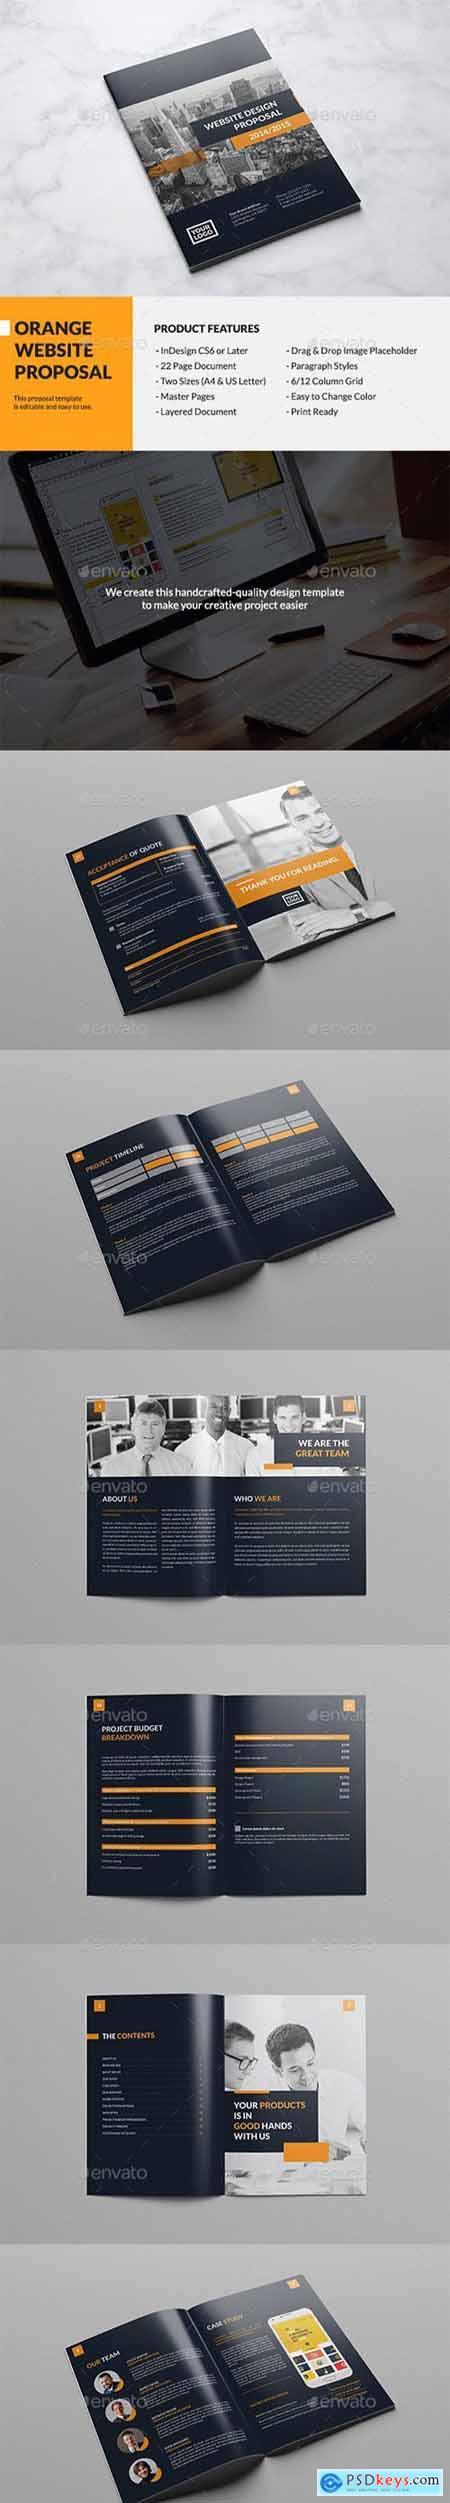 Orange Website Proposal 13001654